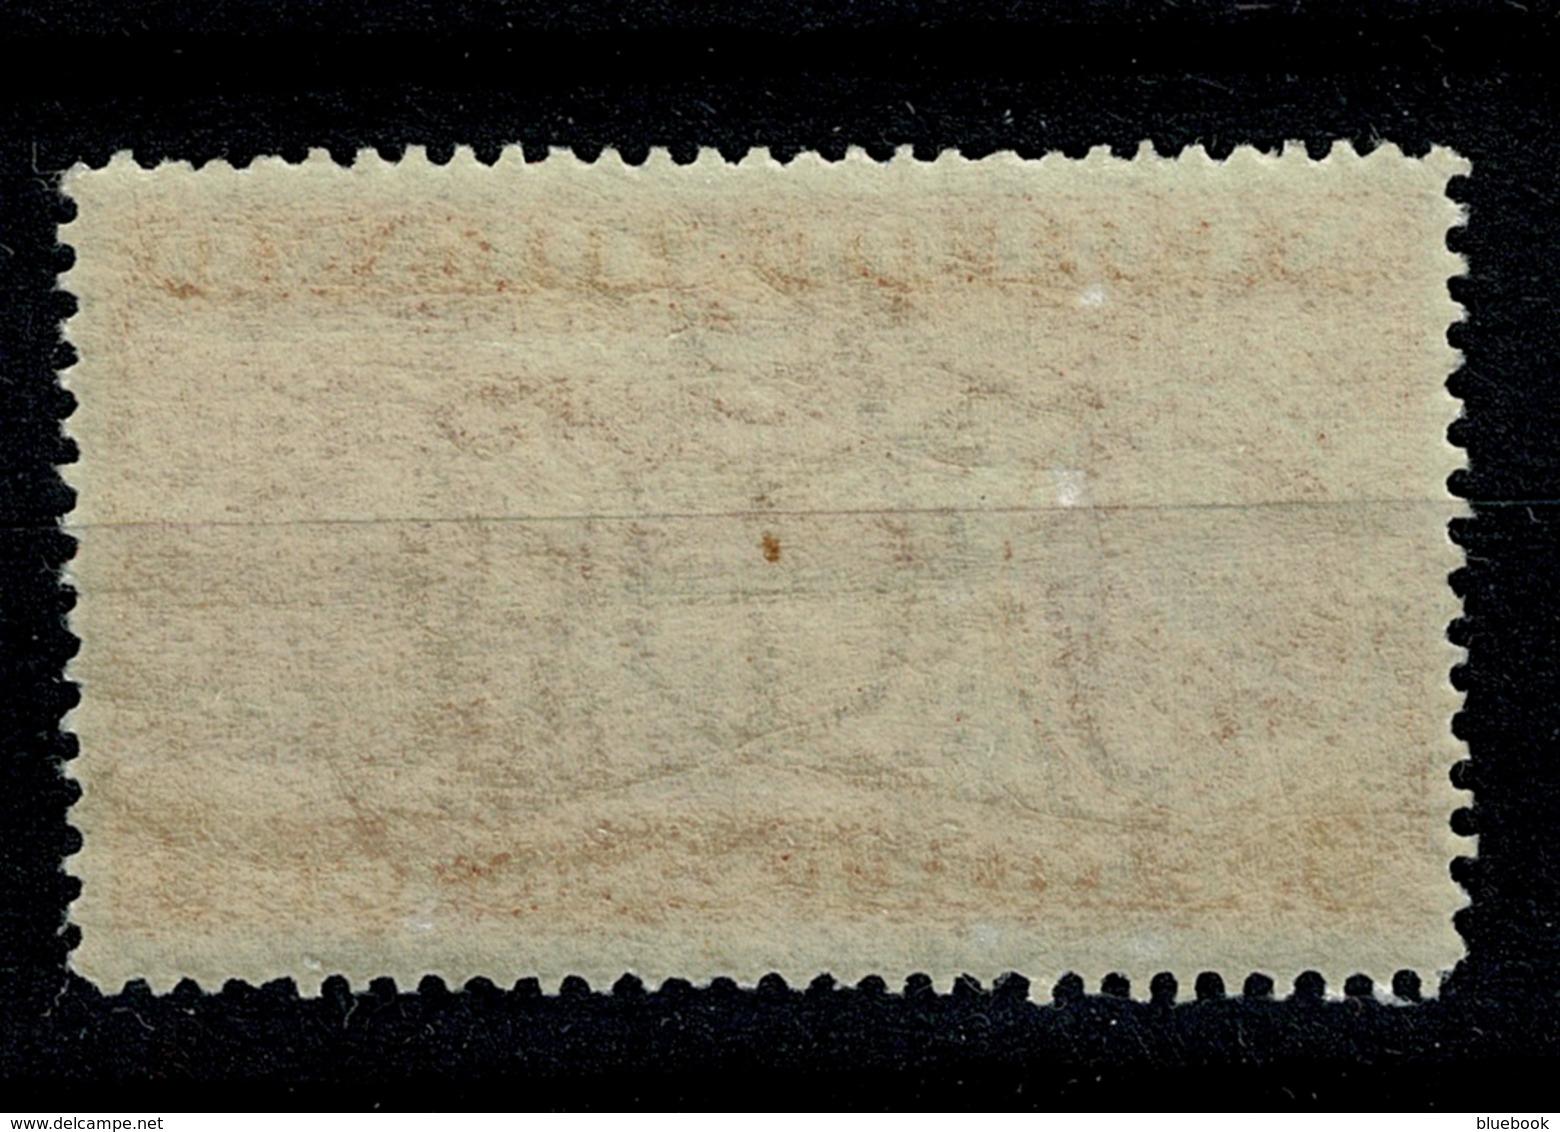 Ref 1289 - Canada Newfoundland 1937 Coronation 8c - SG 260 MNH Stamp - 1908-1947